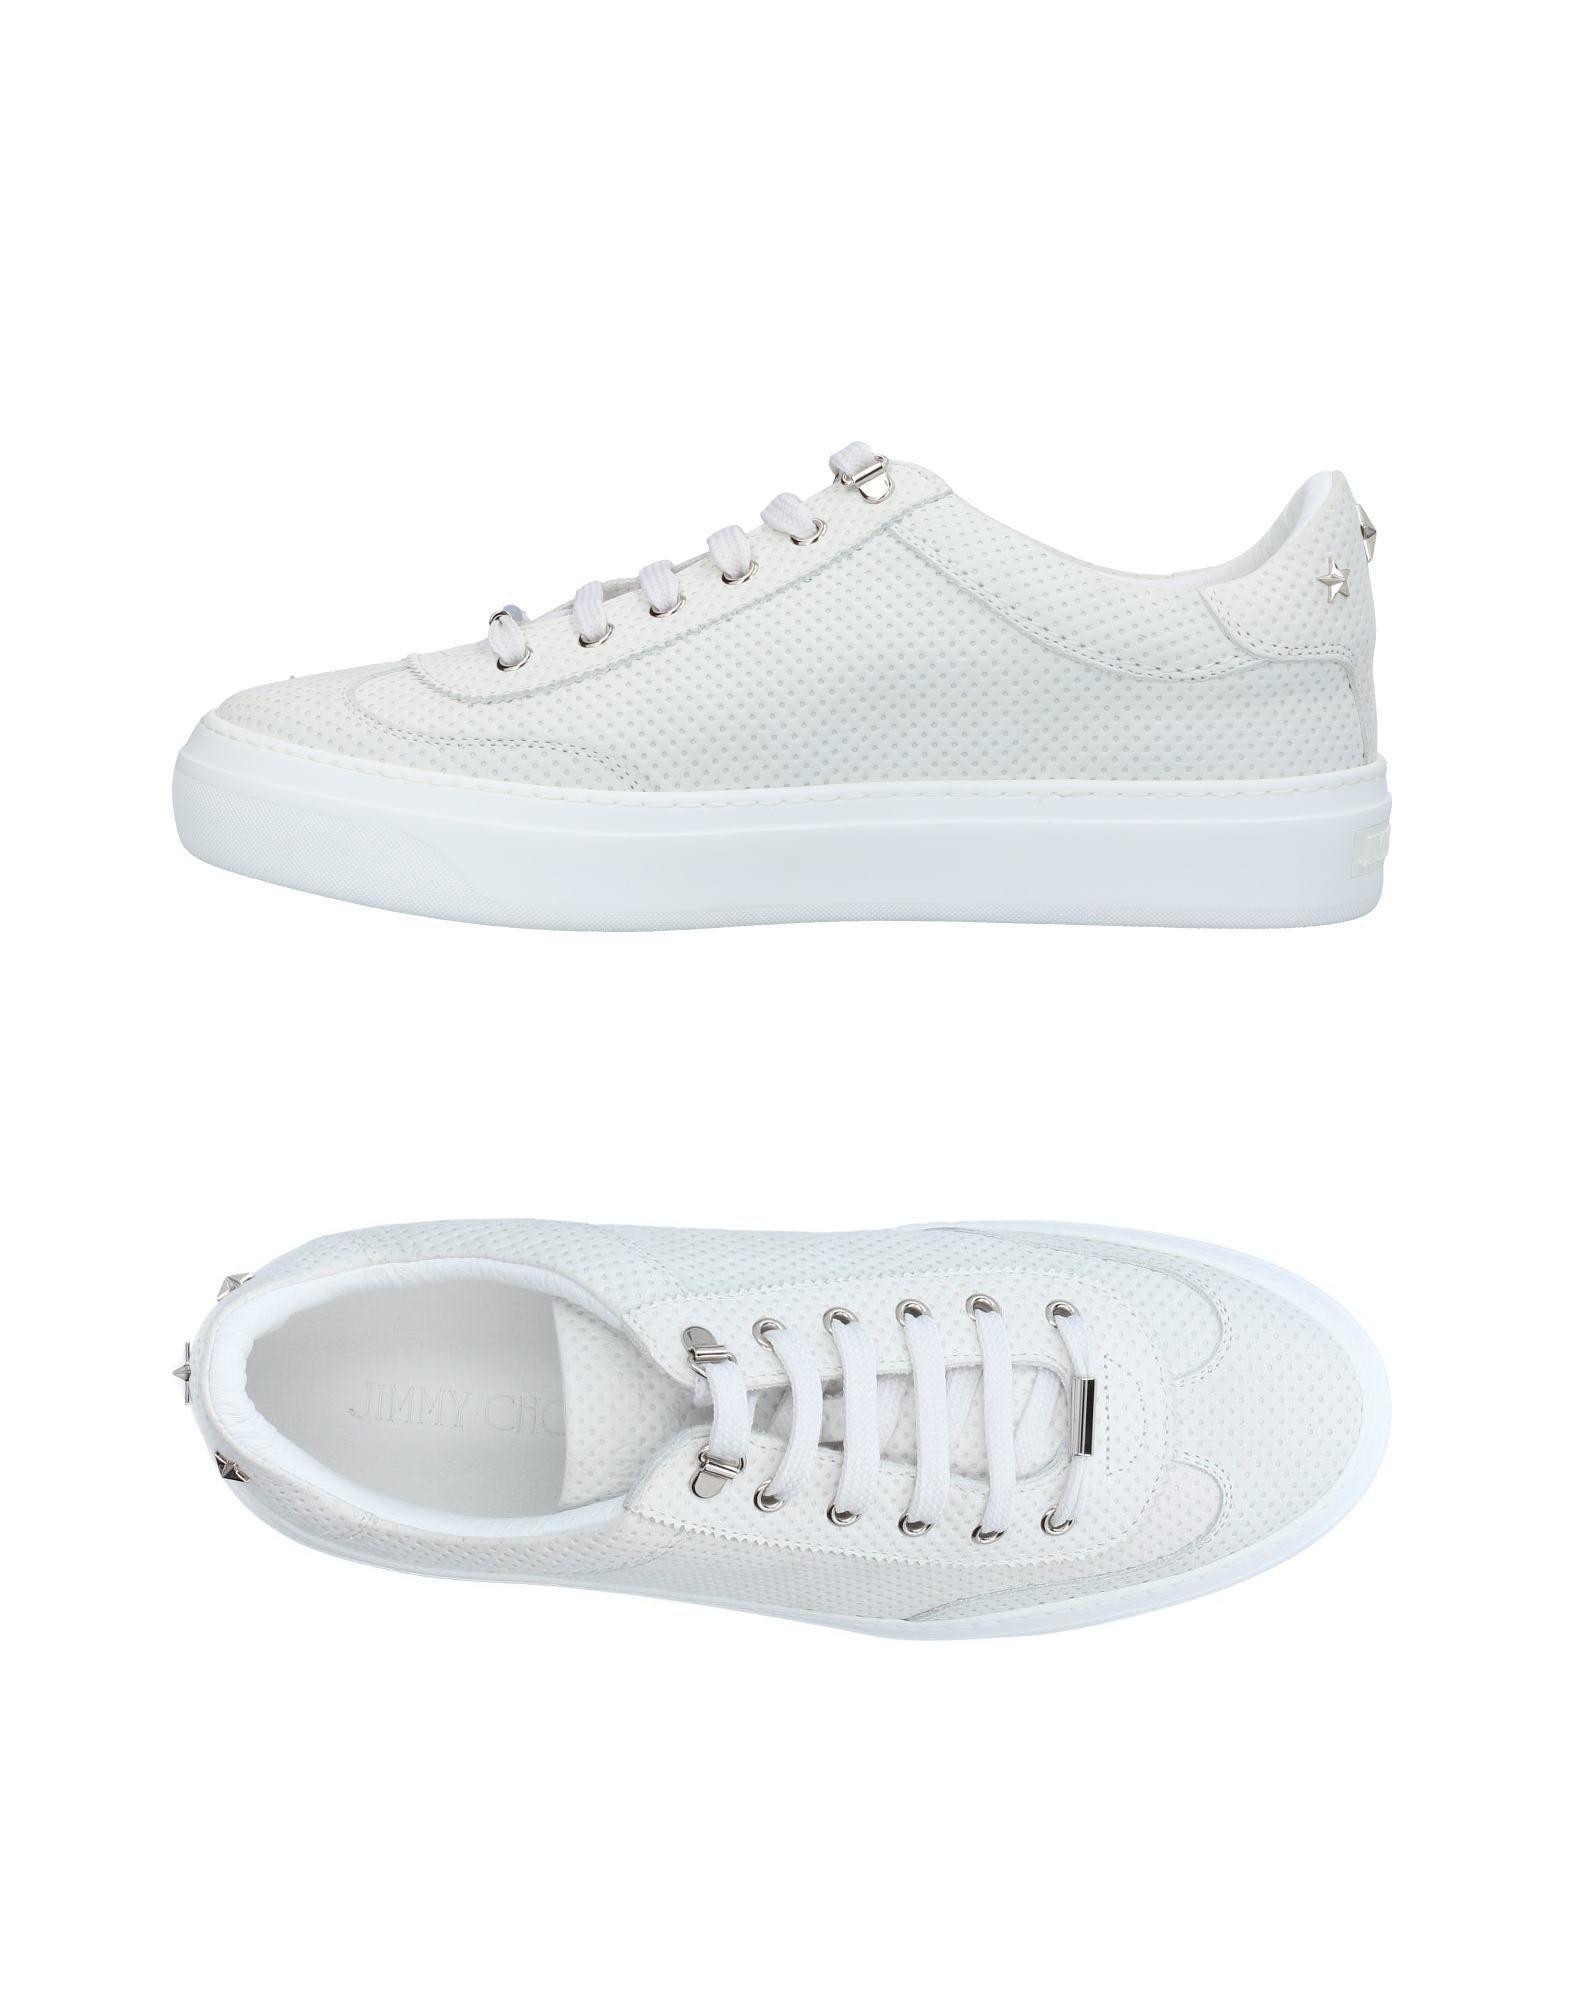 Jimmy Choo Sneakers Herren  11365098HD Gute Qualität beliebte Schuhe